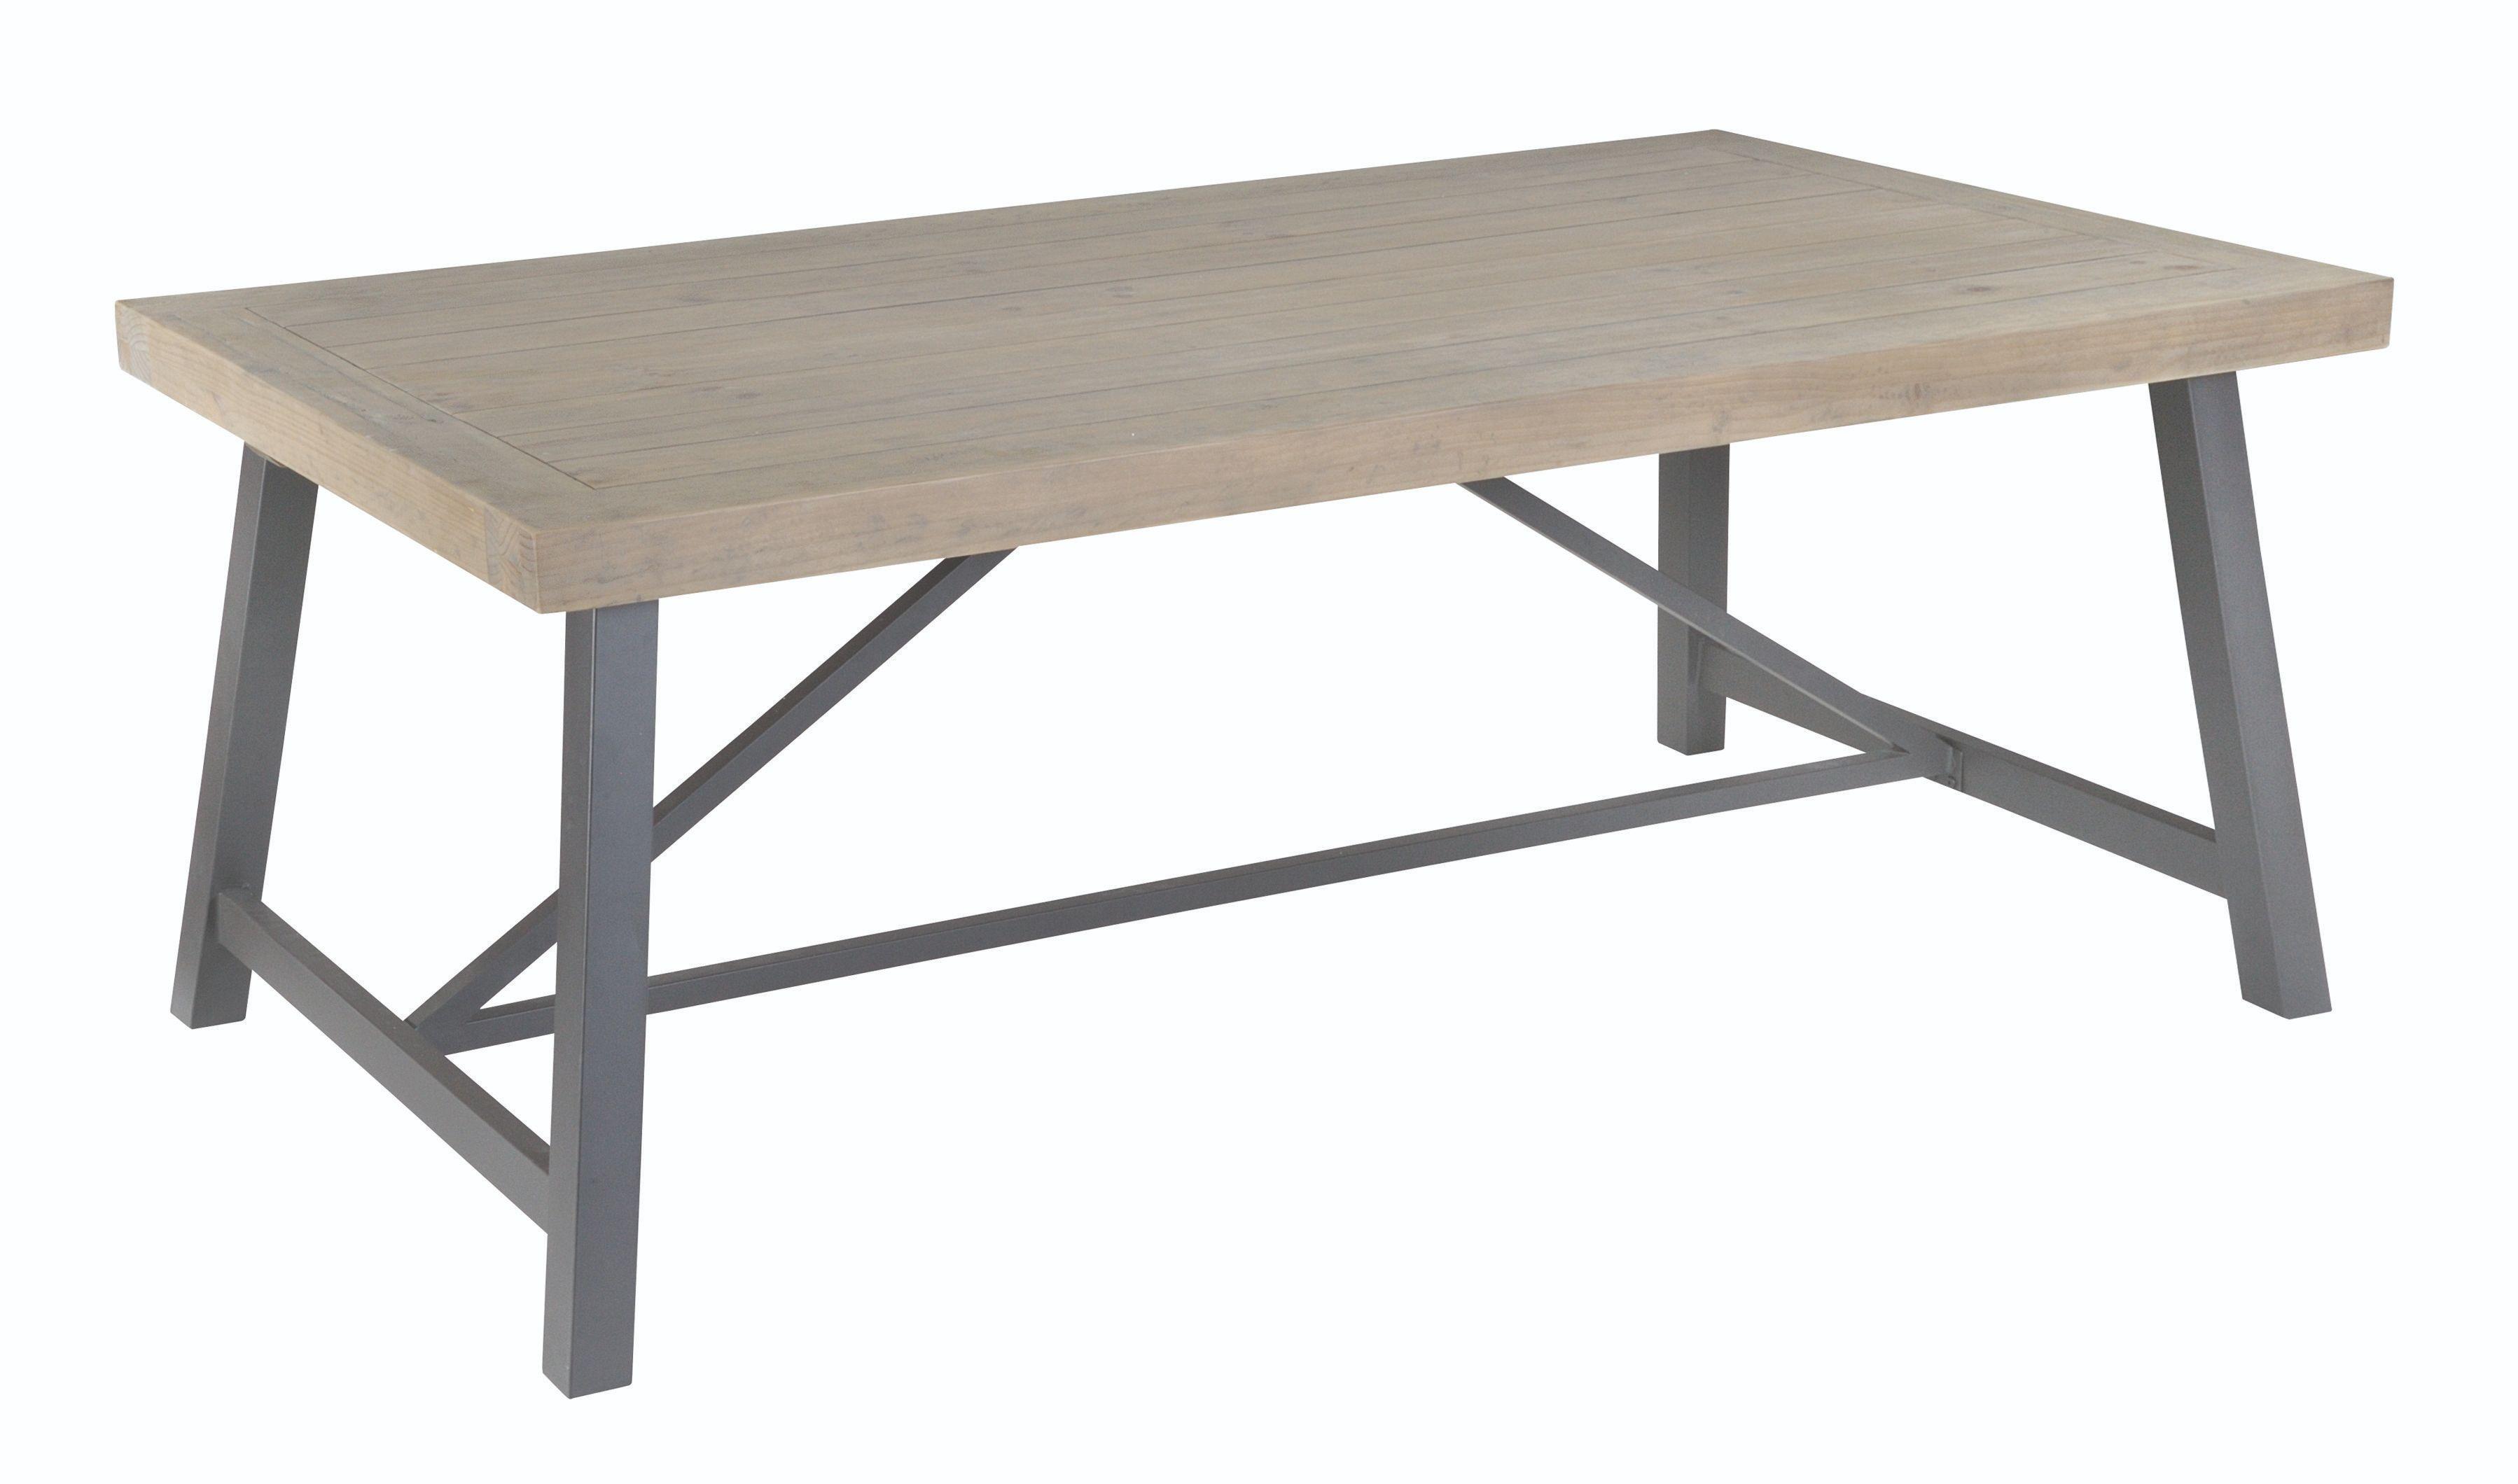 EDDISON 160 DINING TABLE Grey Wash & Steel